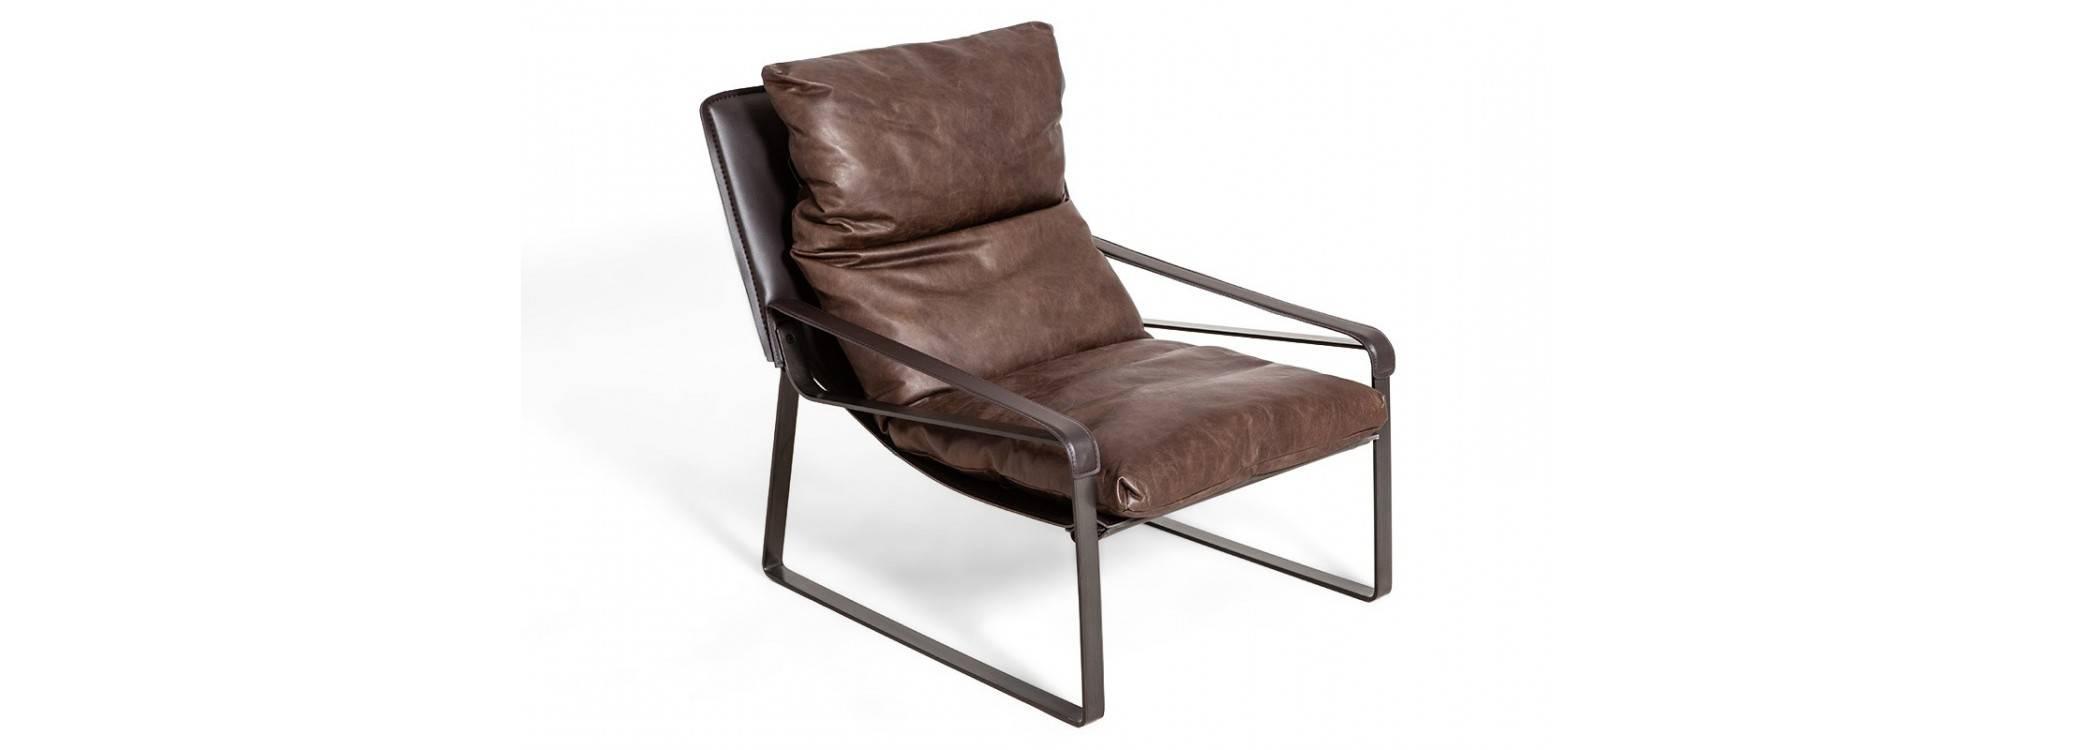 Comfort armchair Buffalo - Brown leather